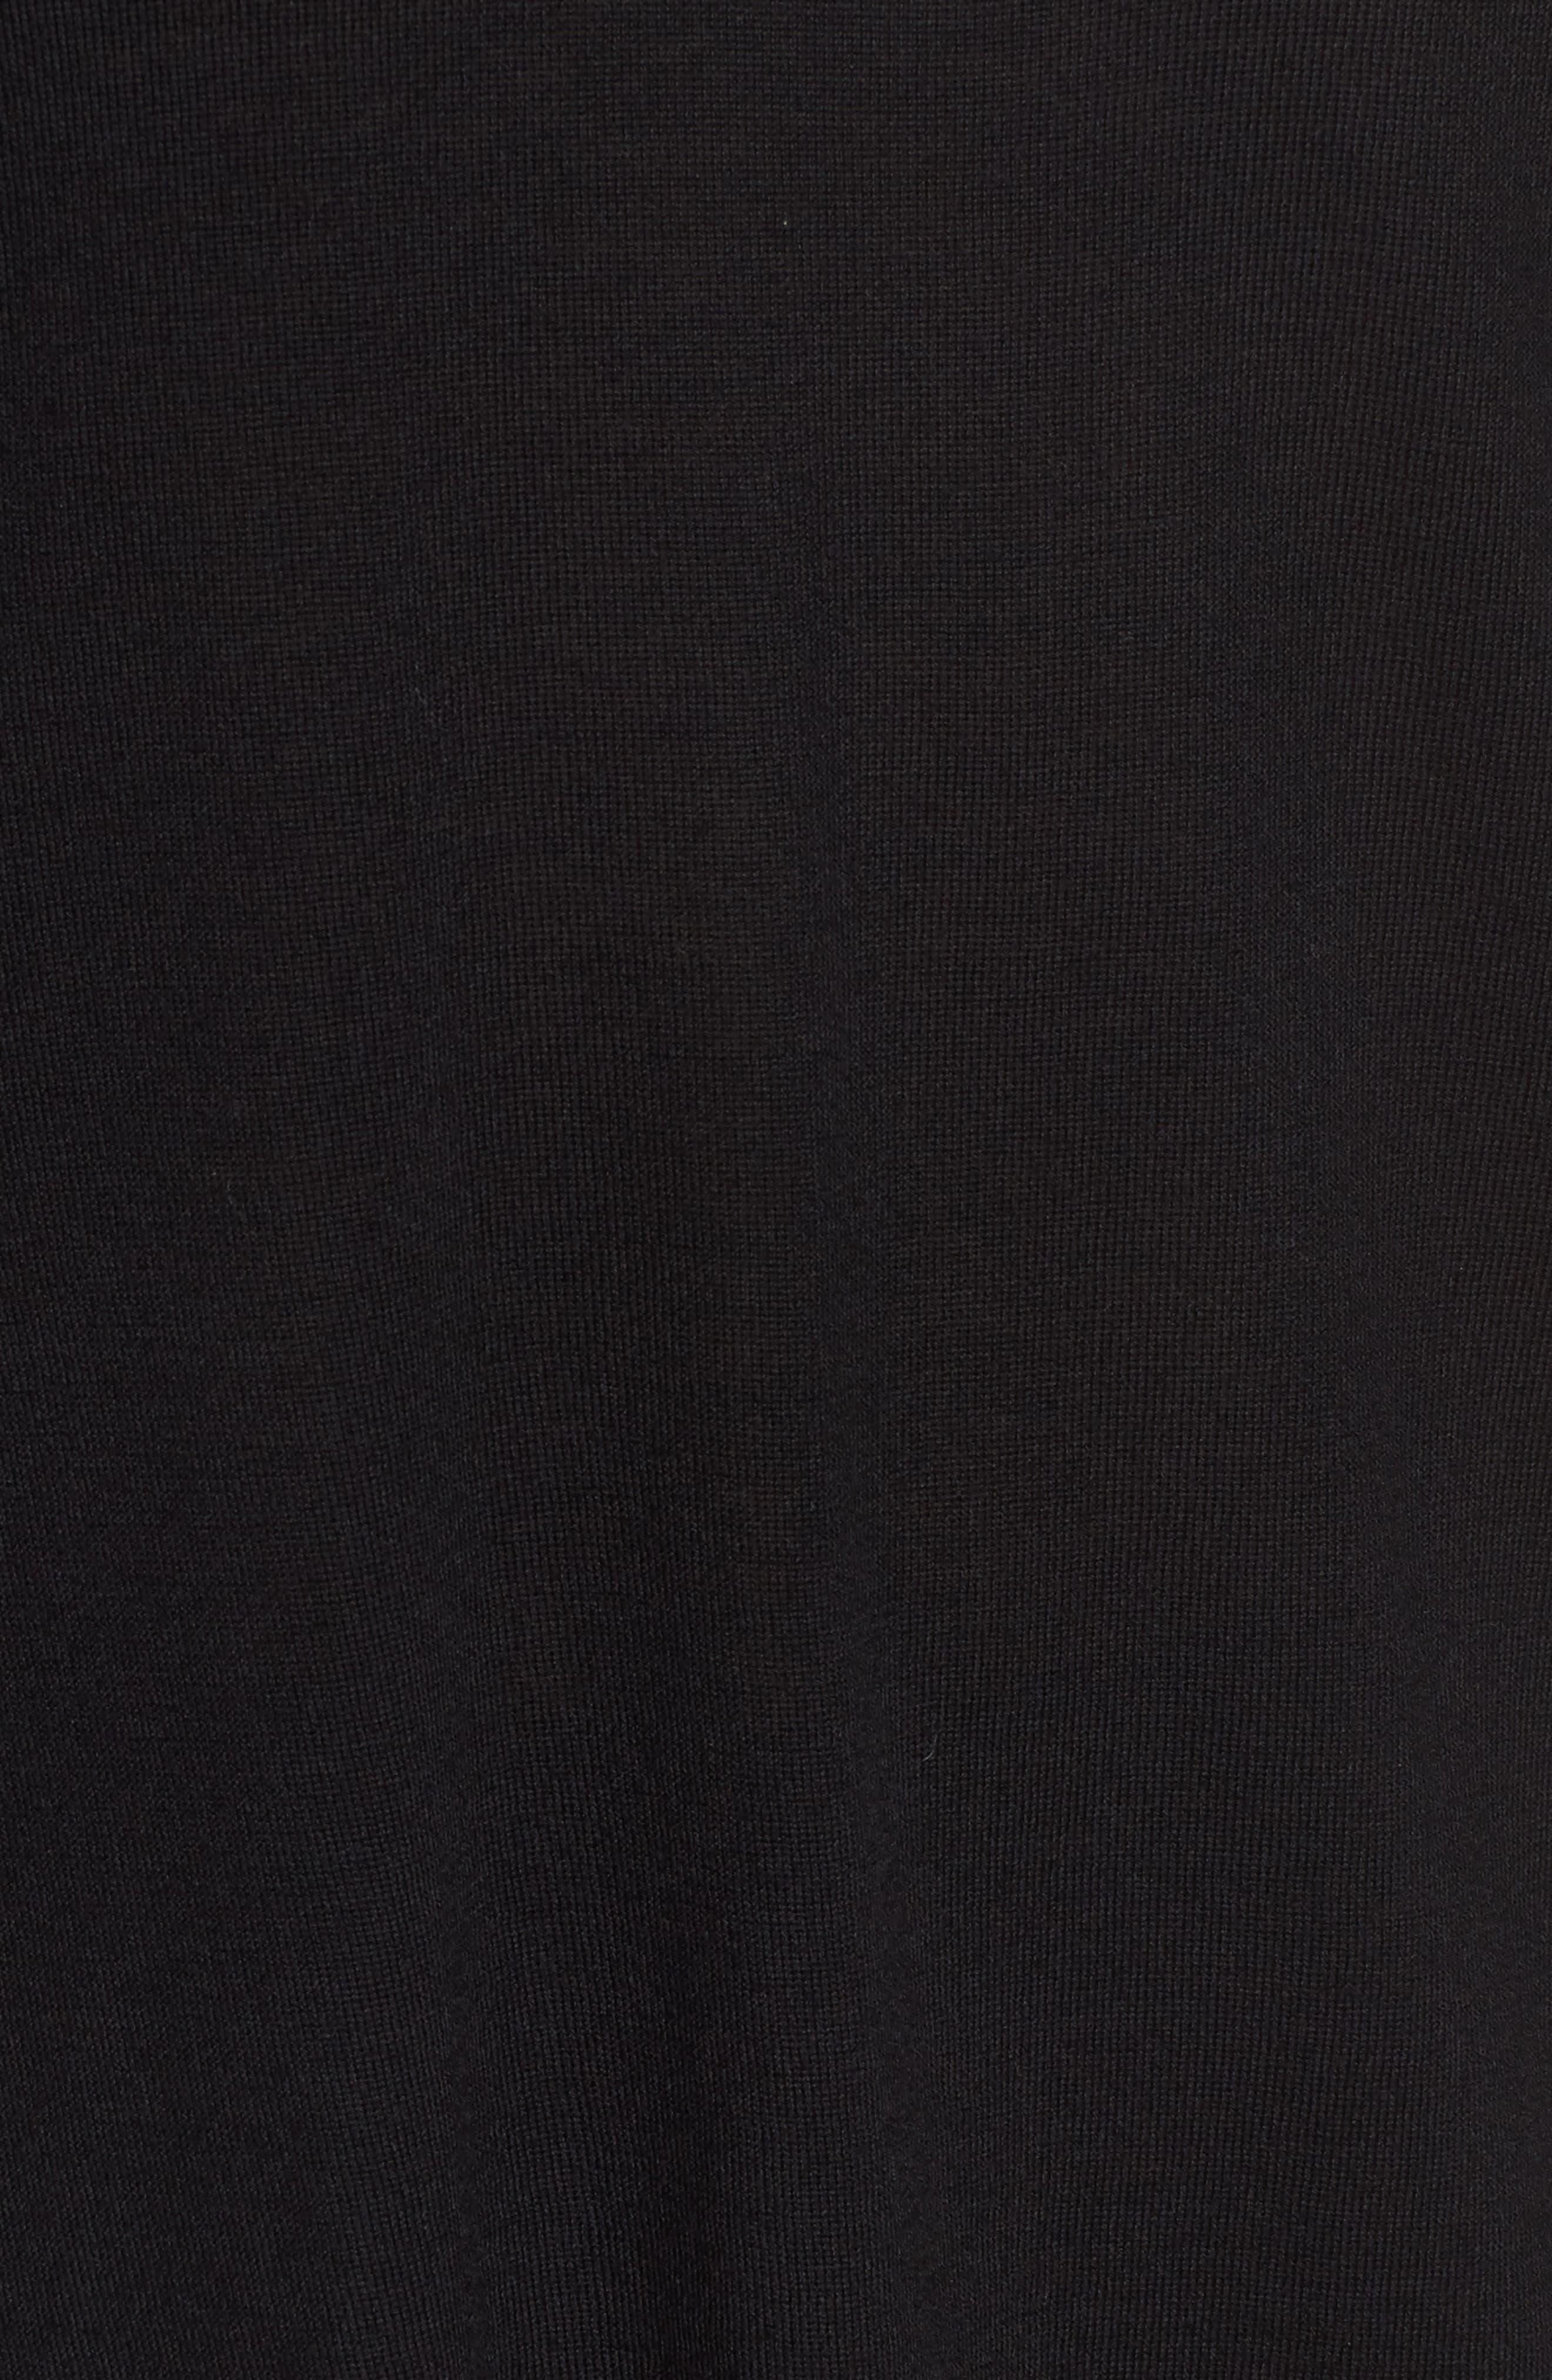 Merino Wool Tunic Sweater,                             Alternate thumbnail 5, color,                             001